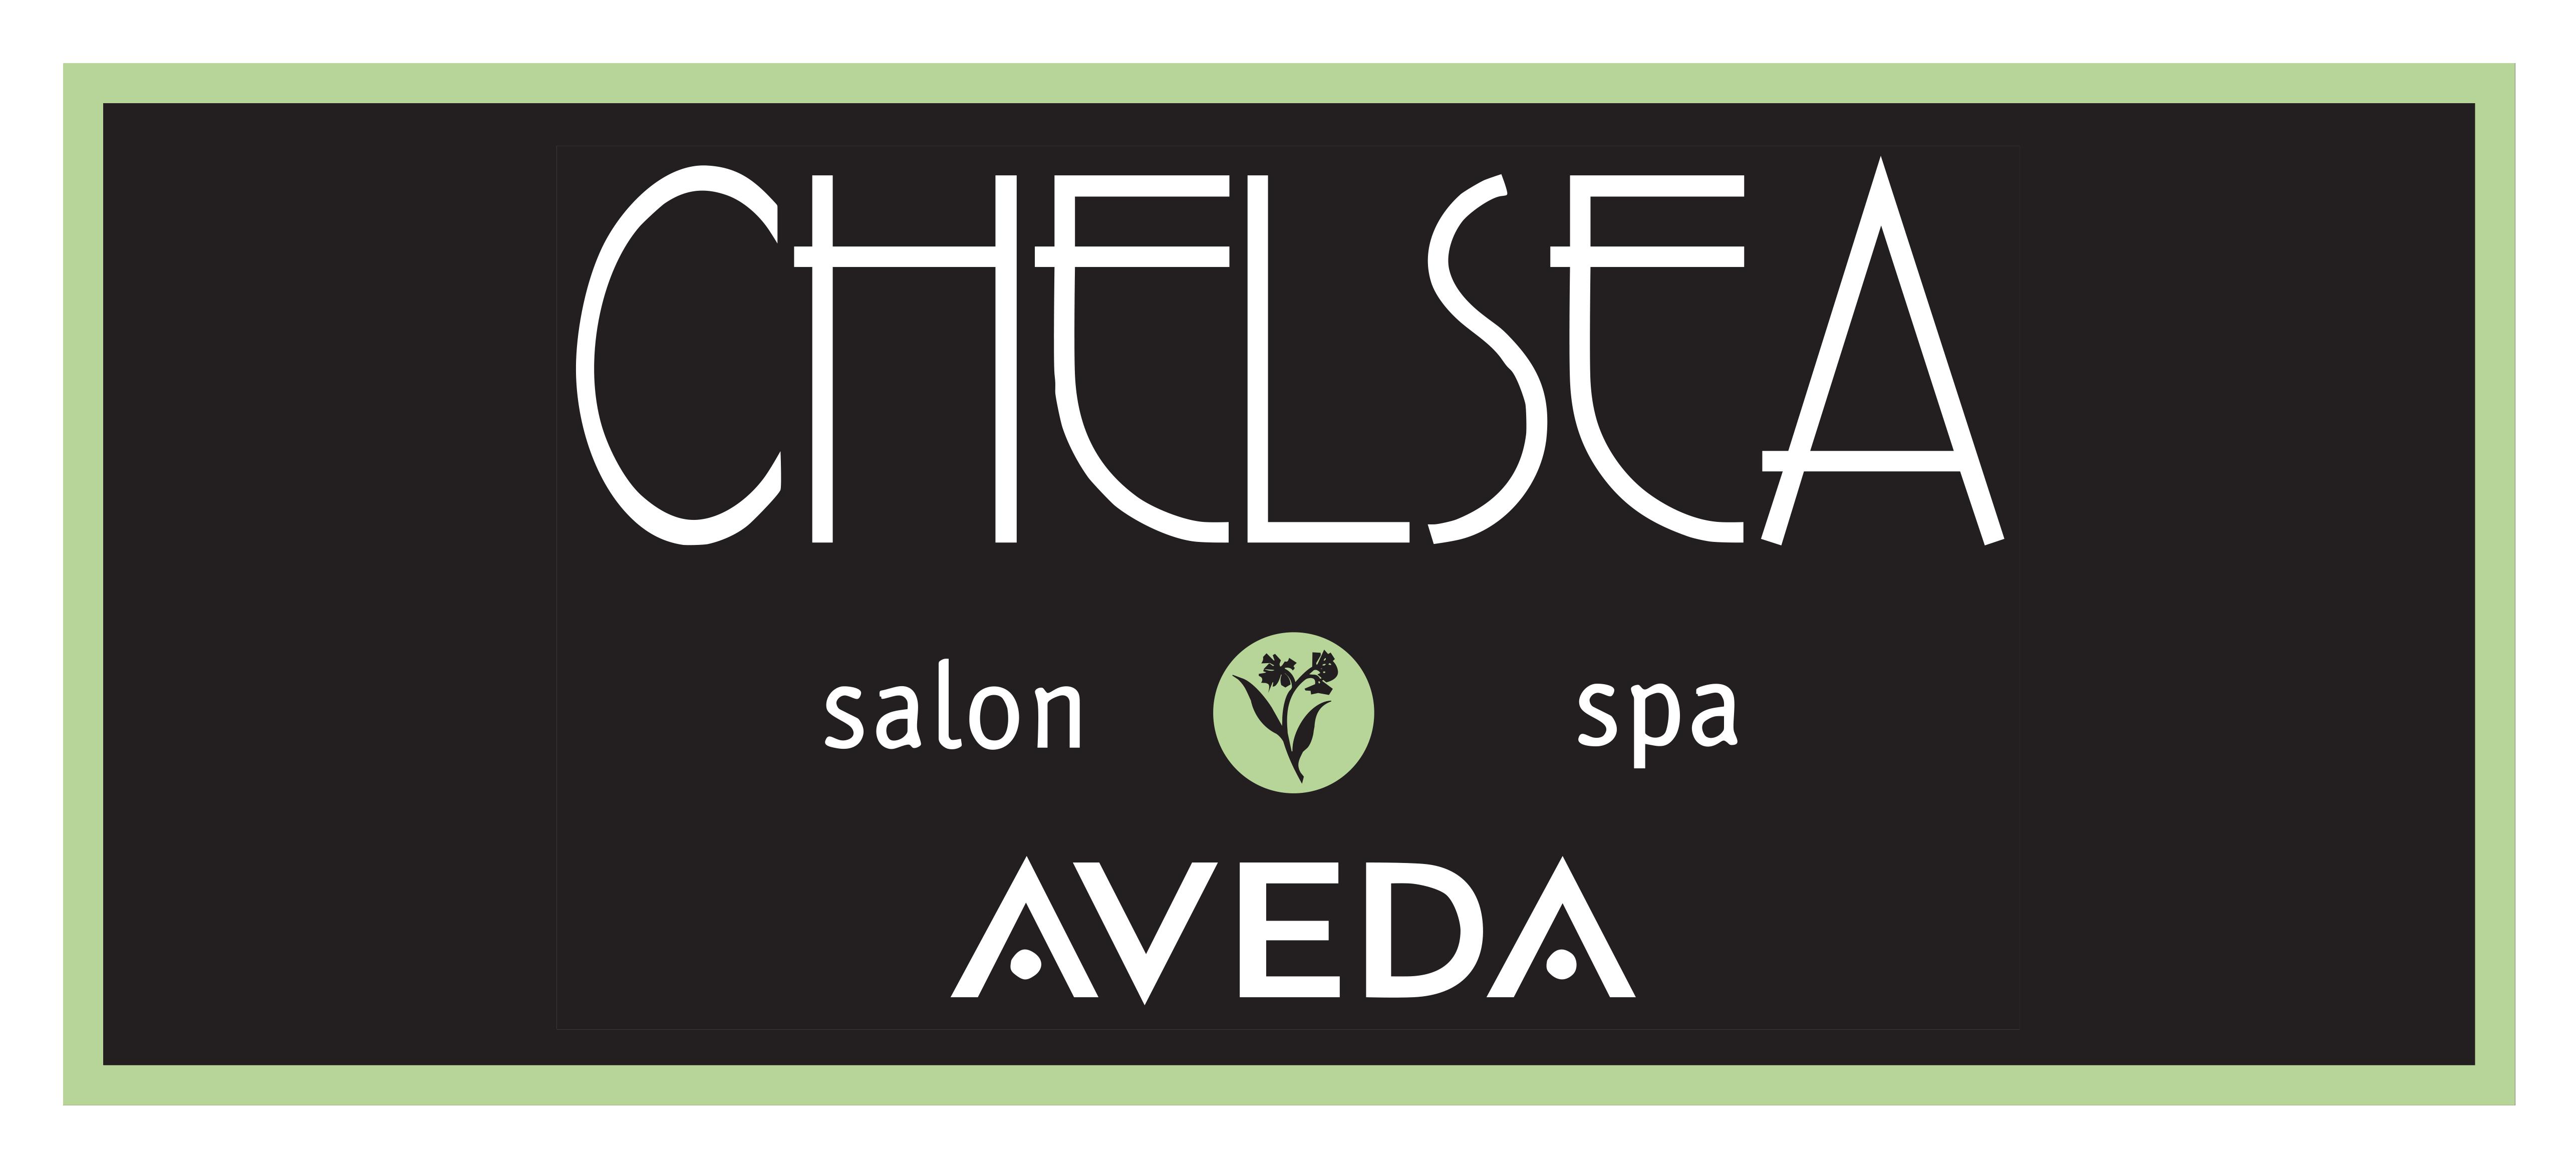 Chelsea Salon and Spa